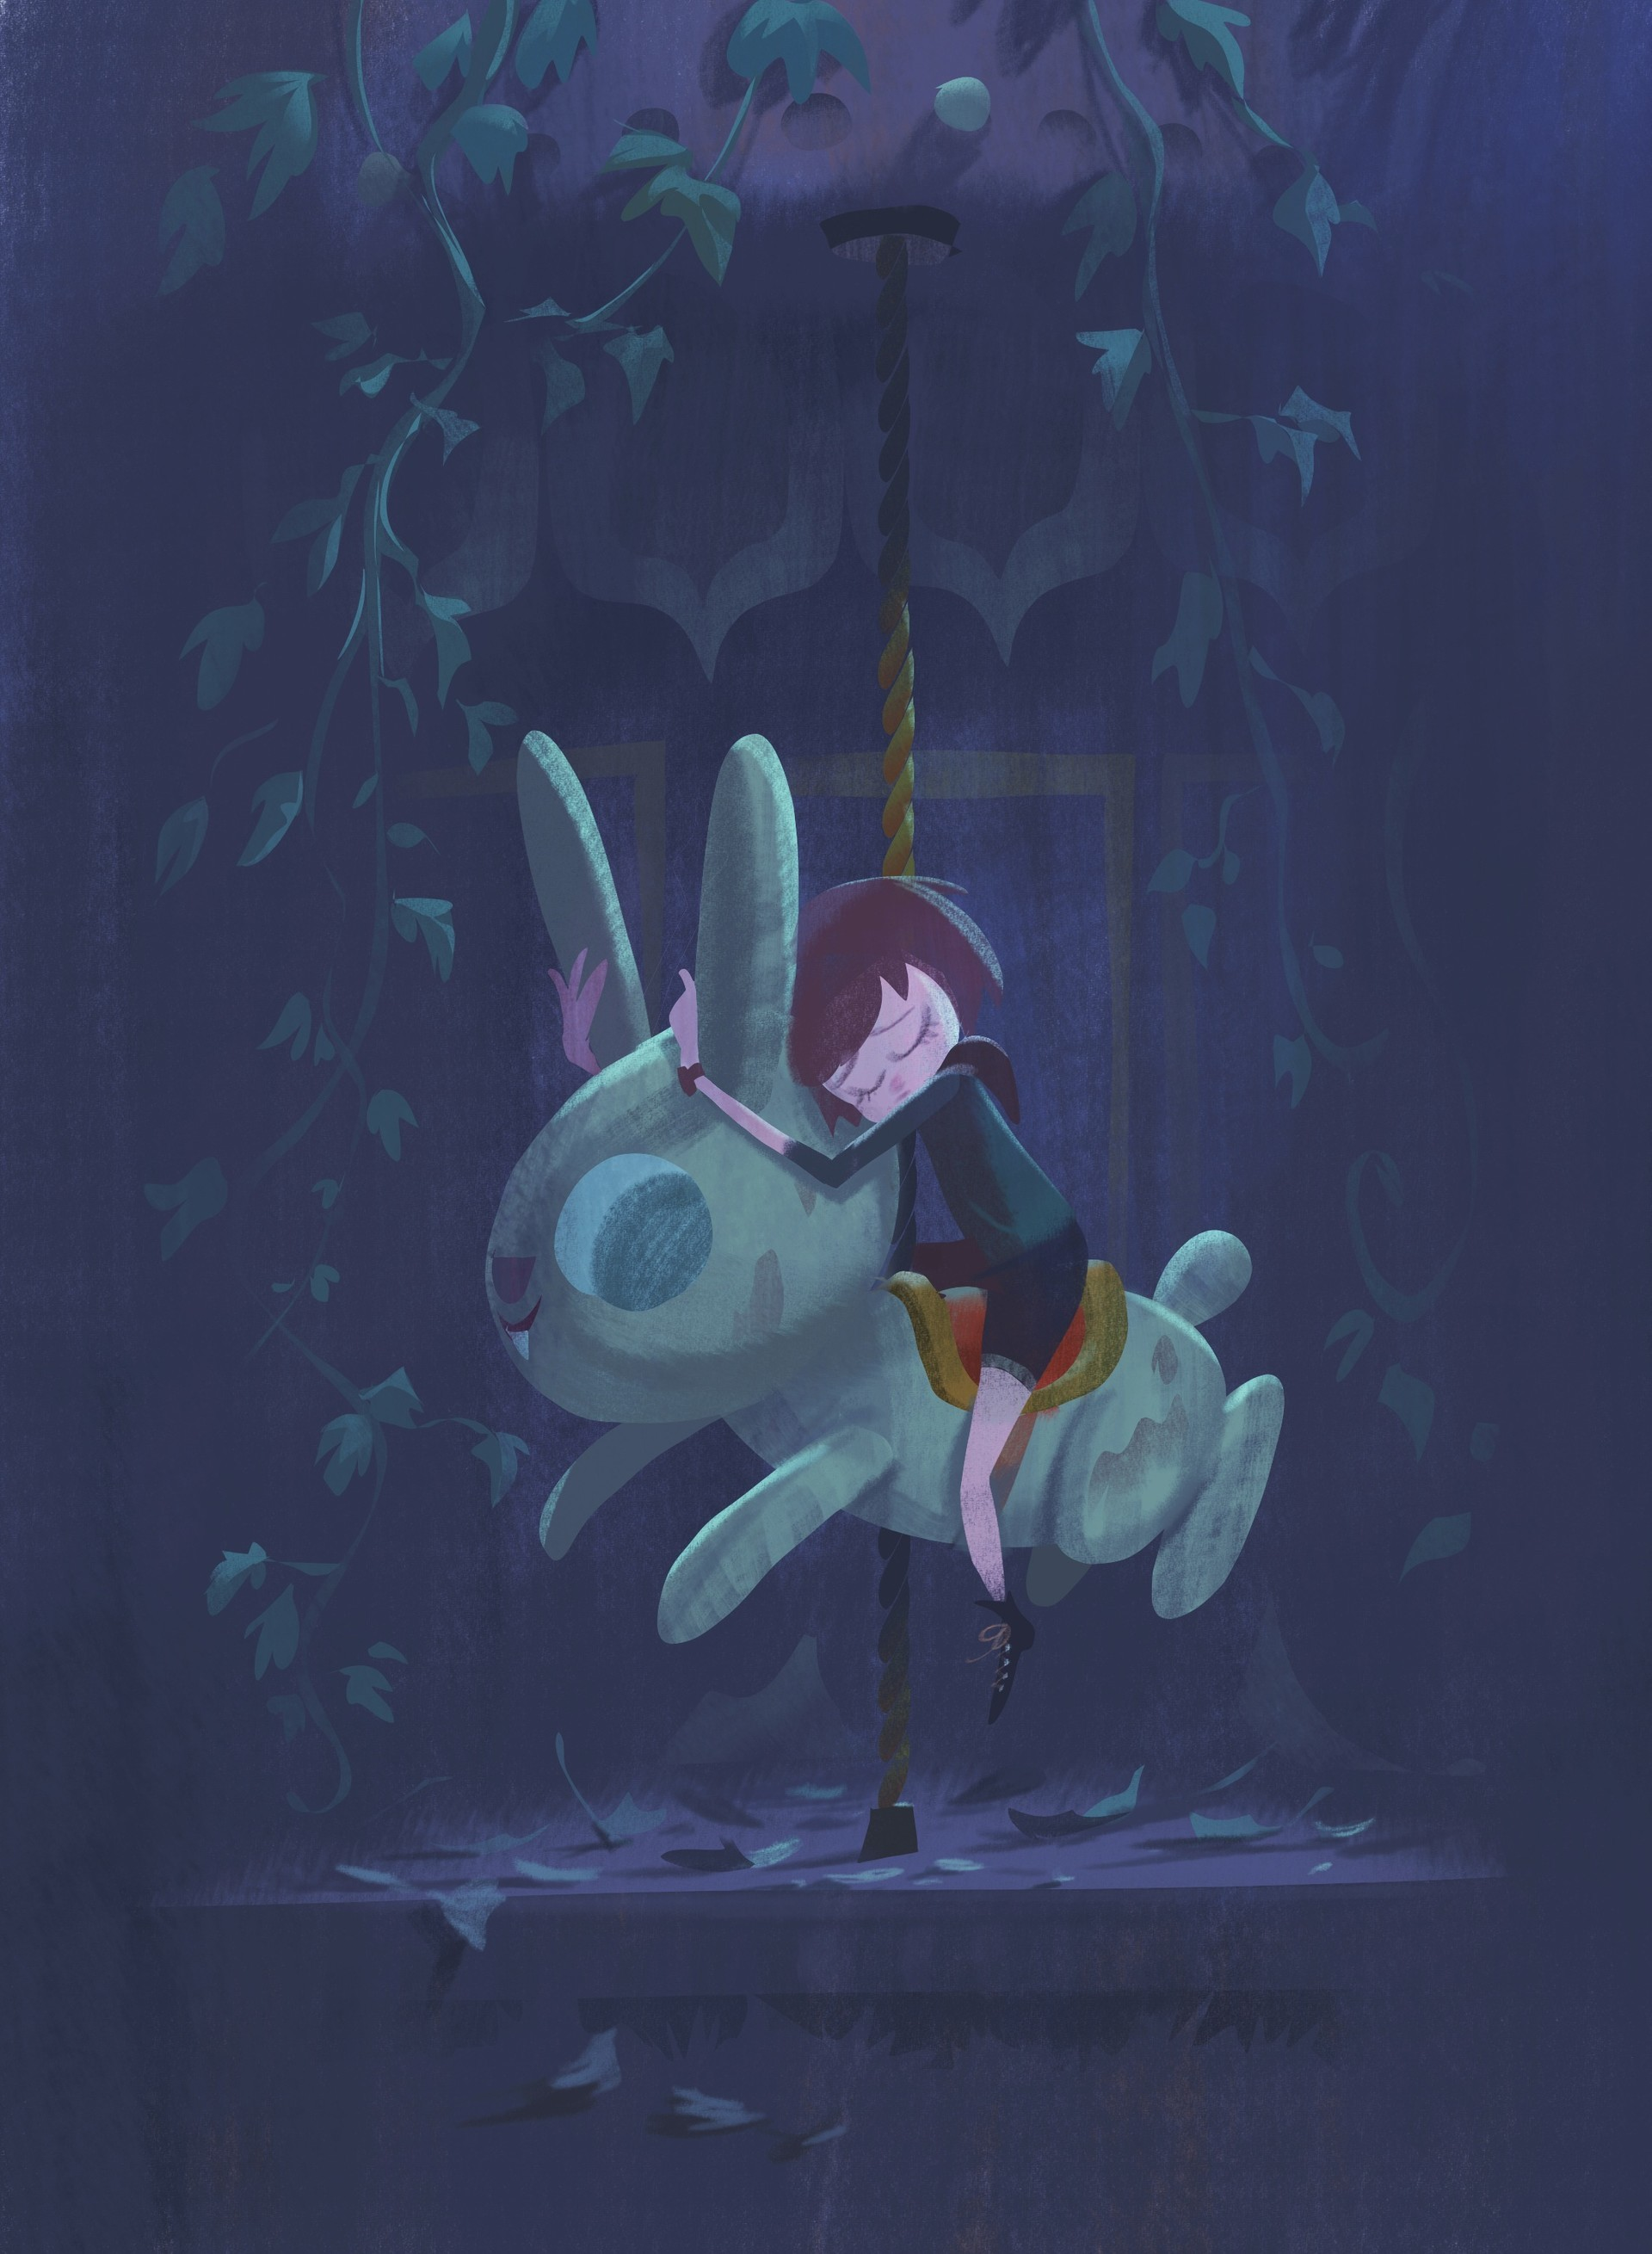 Rustam hasanov rustam hasanov carousel bunny forprint